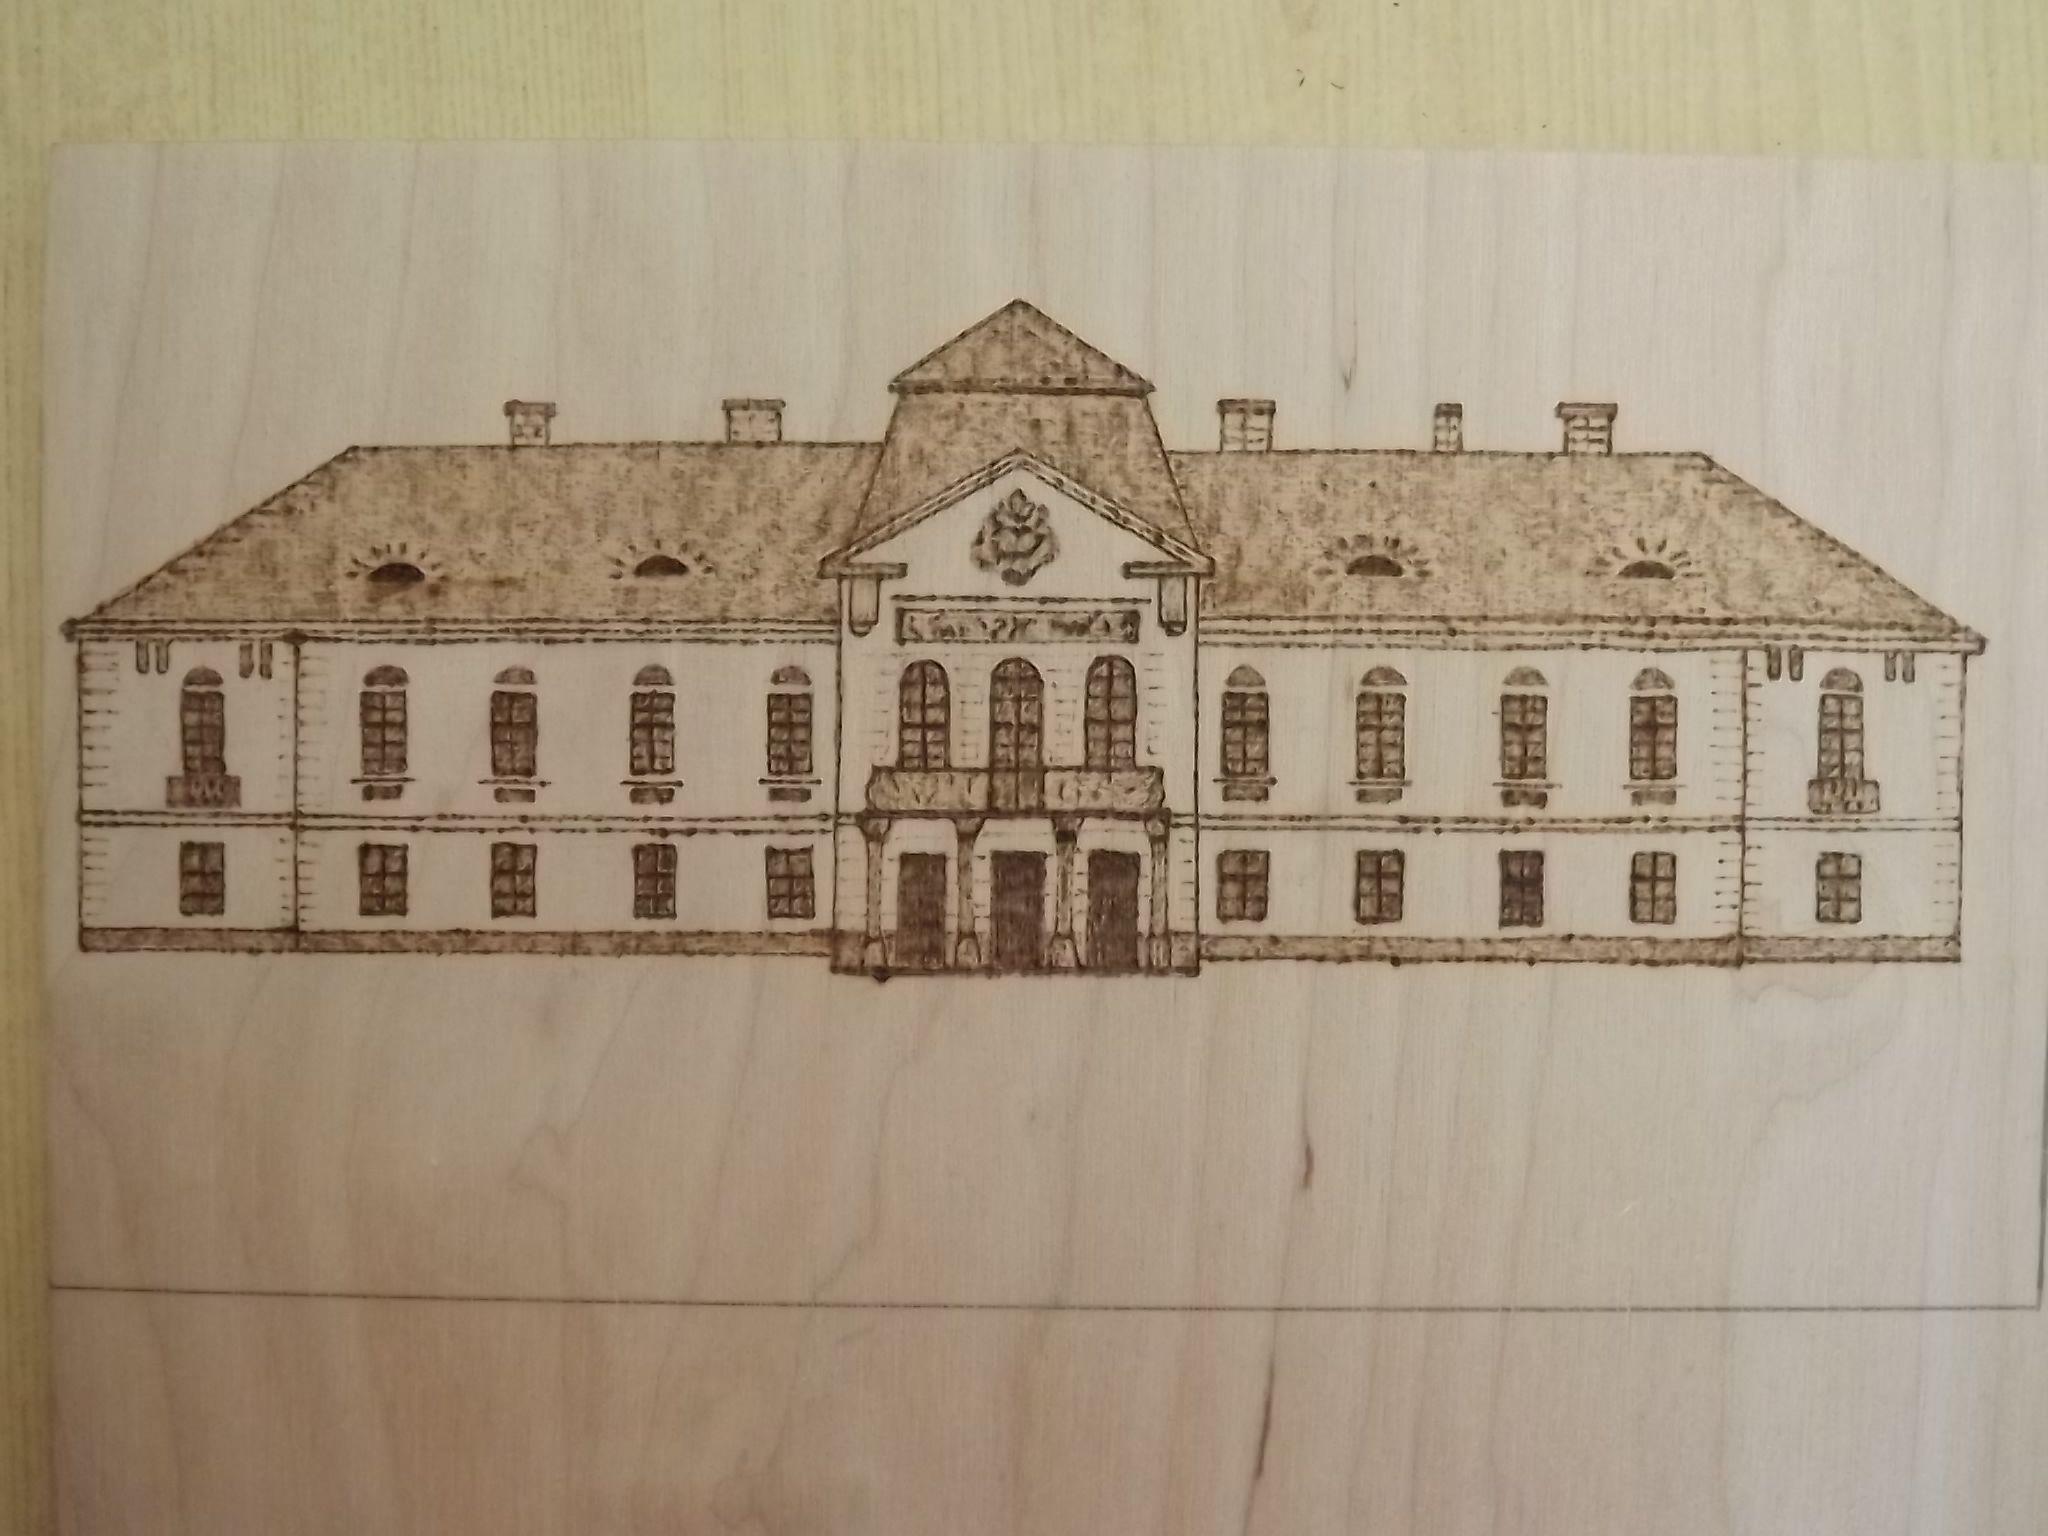 Nagycenk Széchenyi kastély